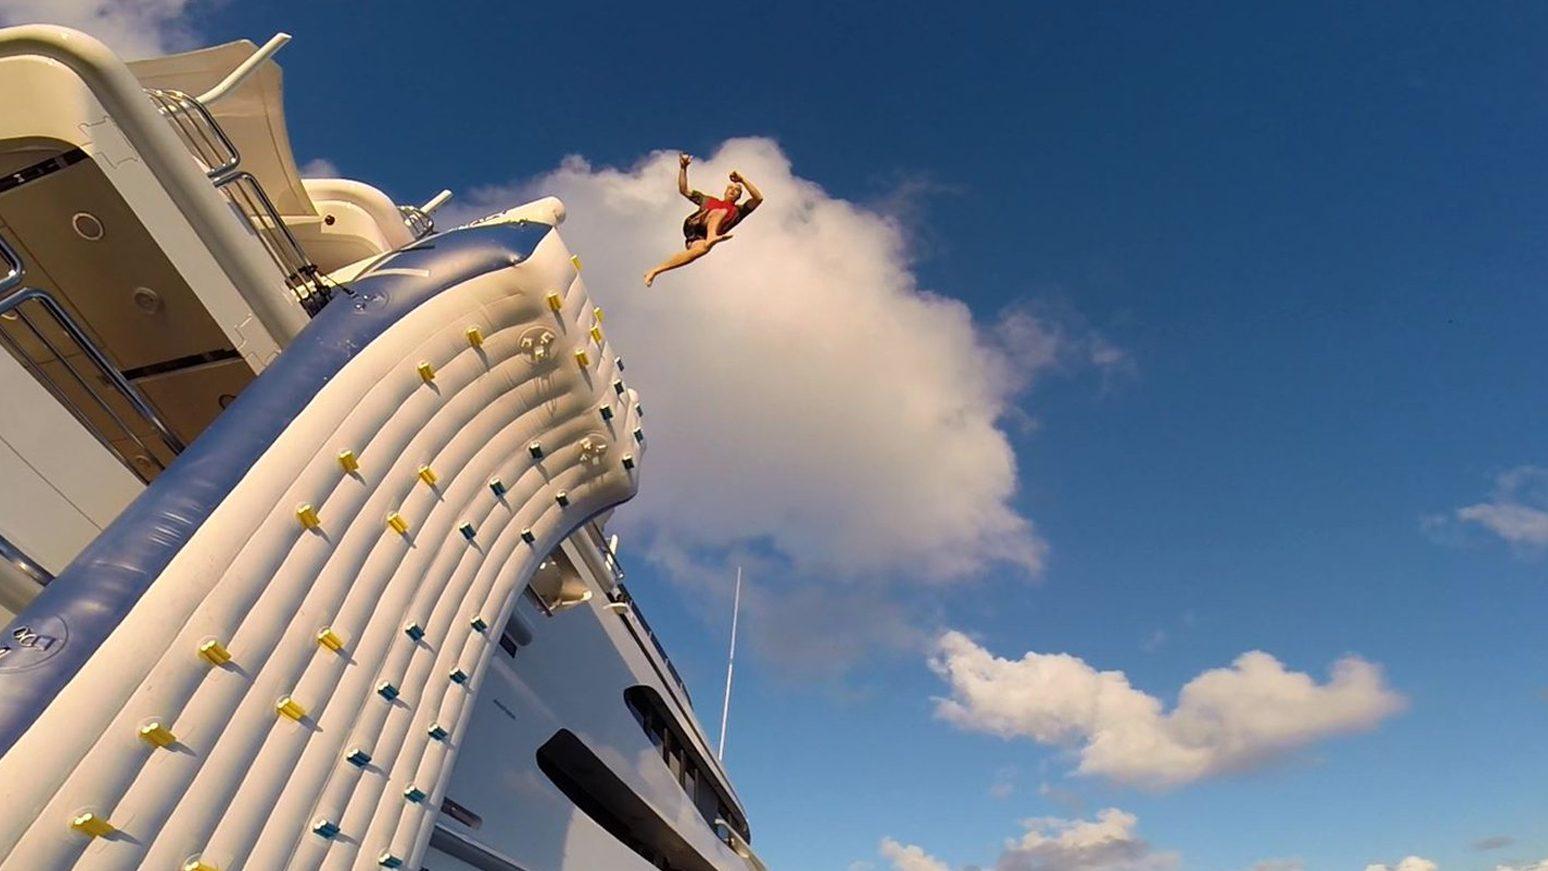 FunAir gallery climbing wall leap